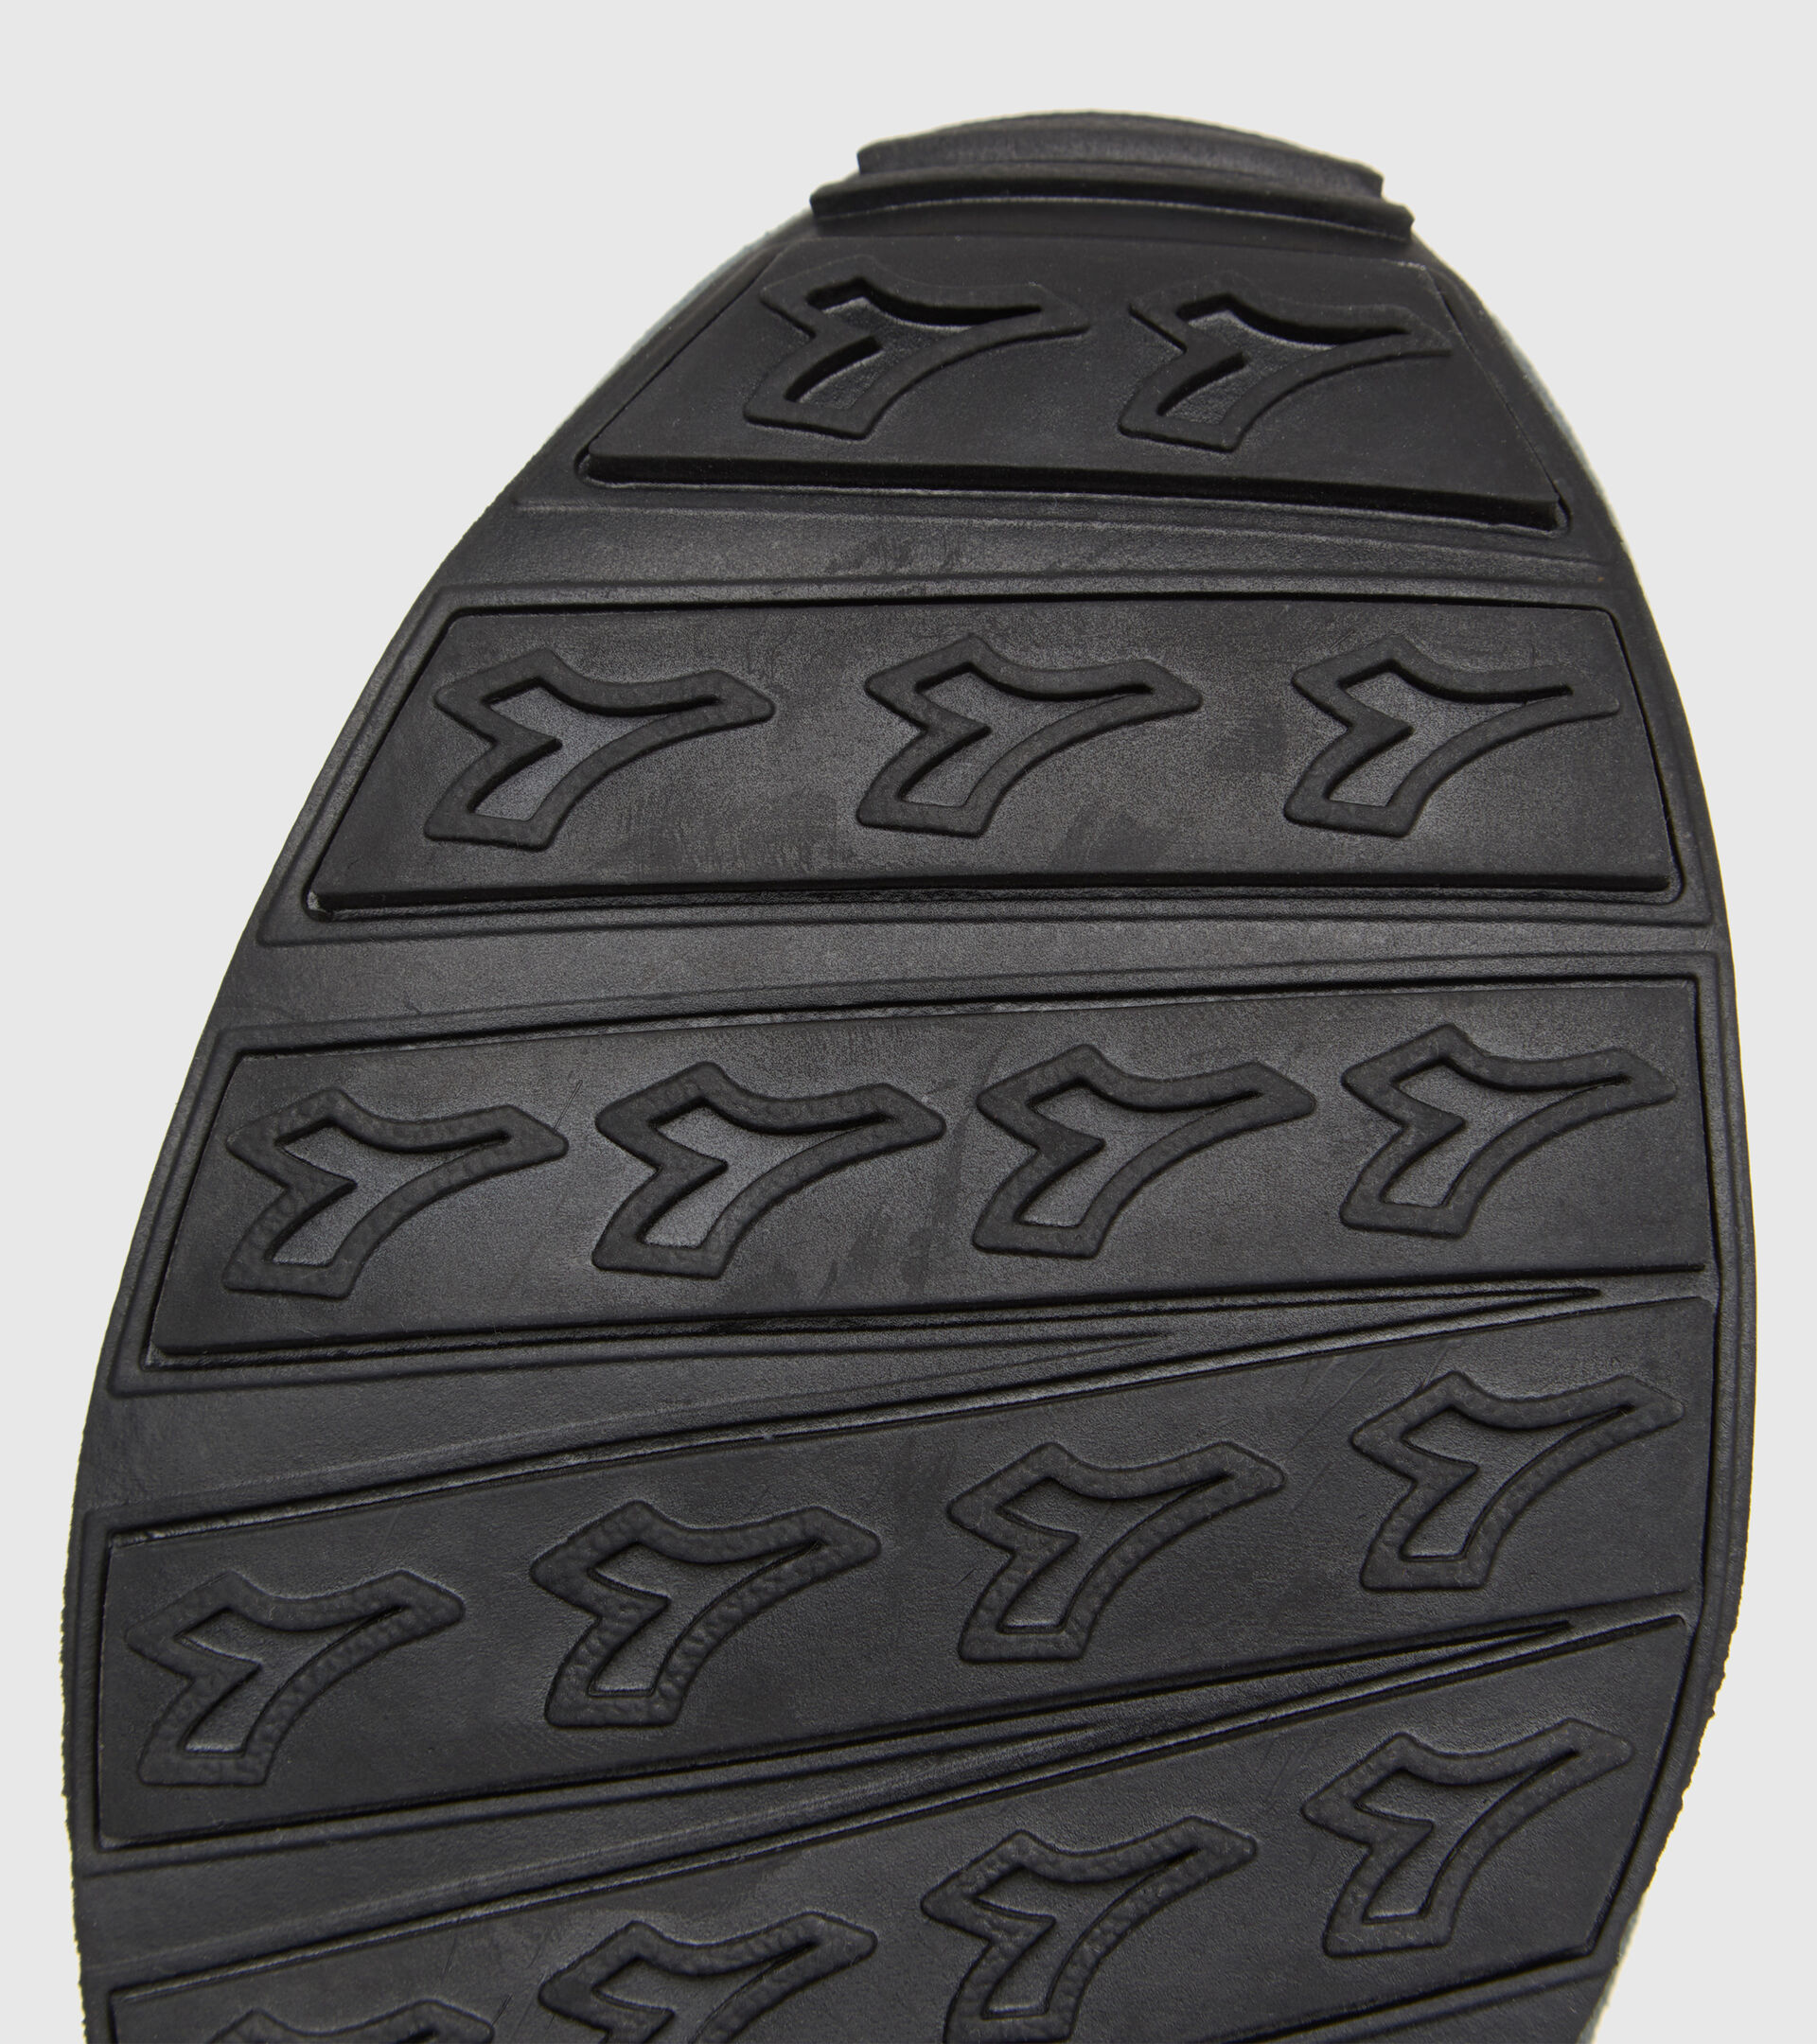 Trainer - Unisex CAMARO TURBULENCE/BLACK - Diadora